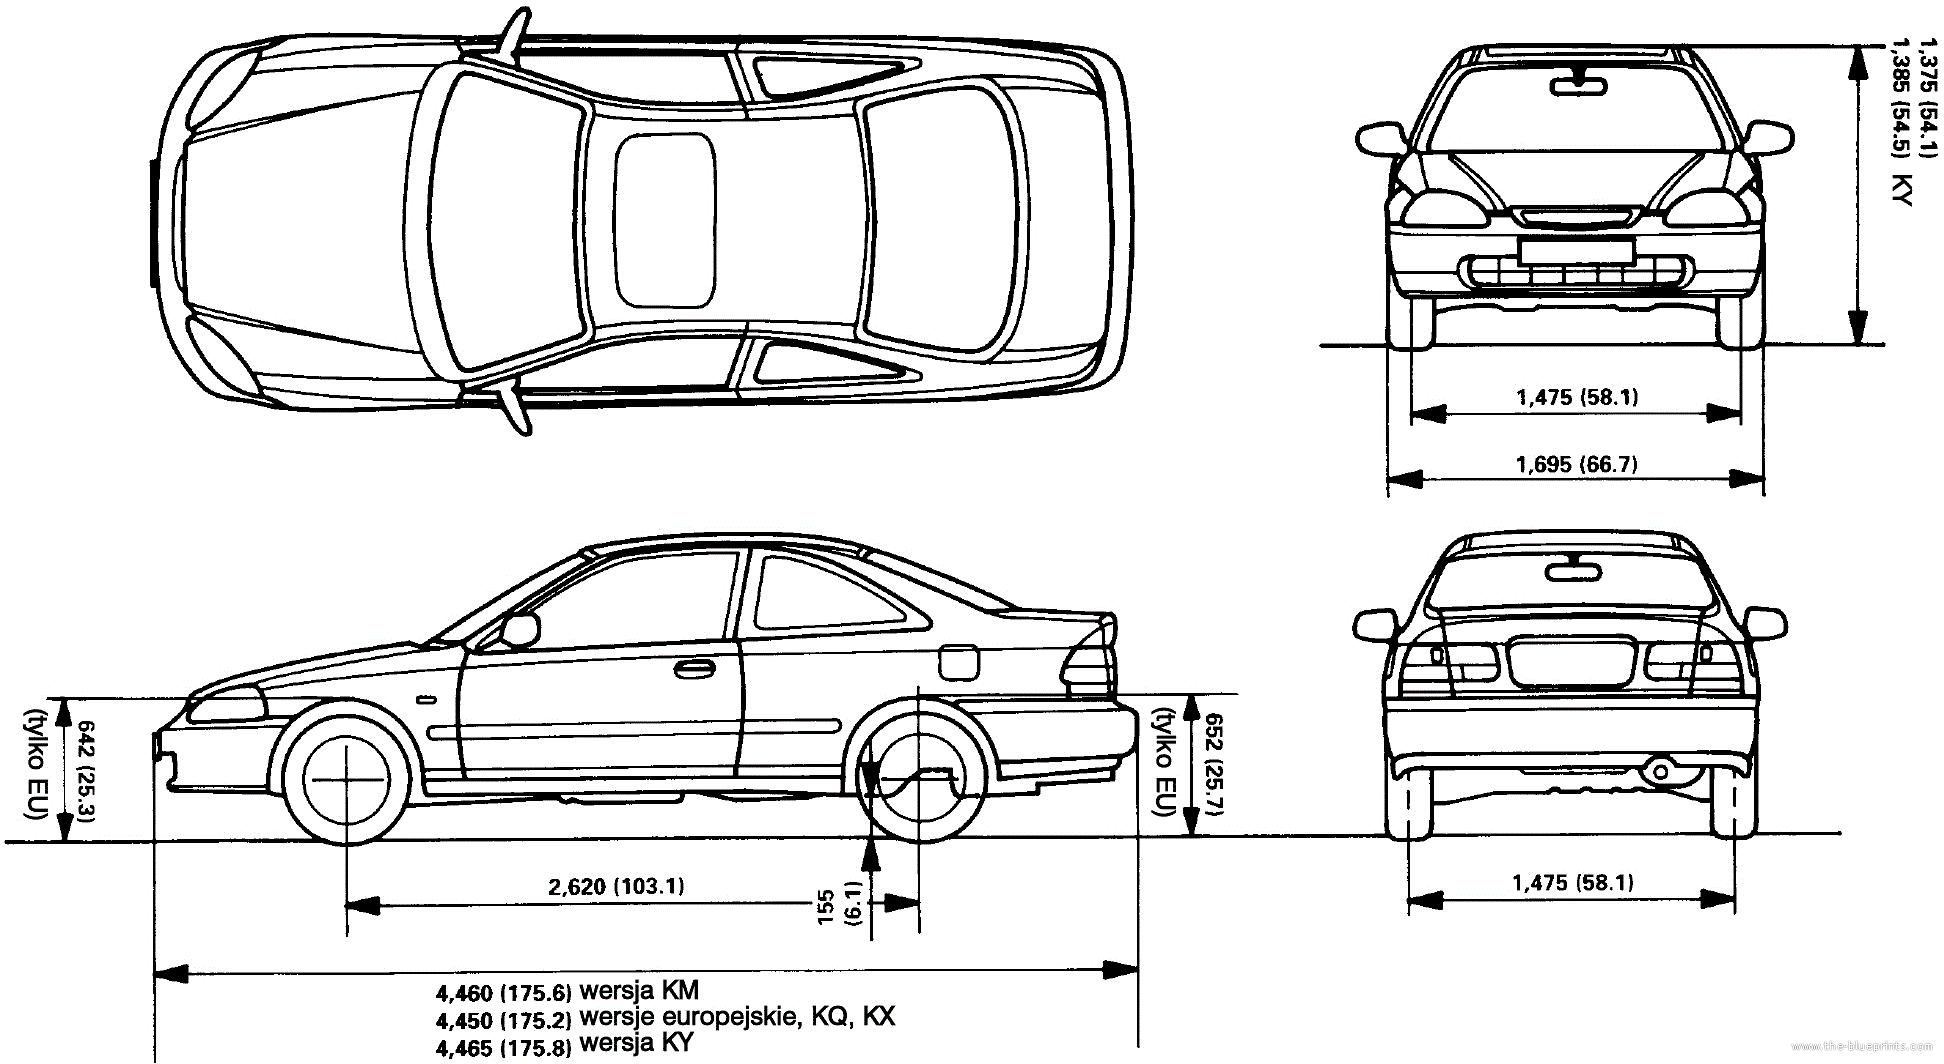 Blueprints Gt Cars Gt Honda Gt Honda Civic